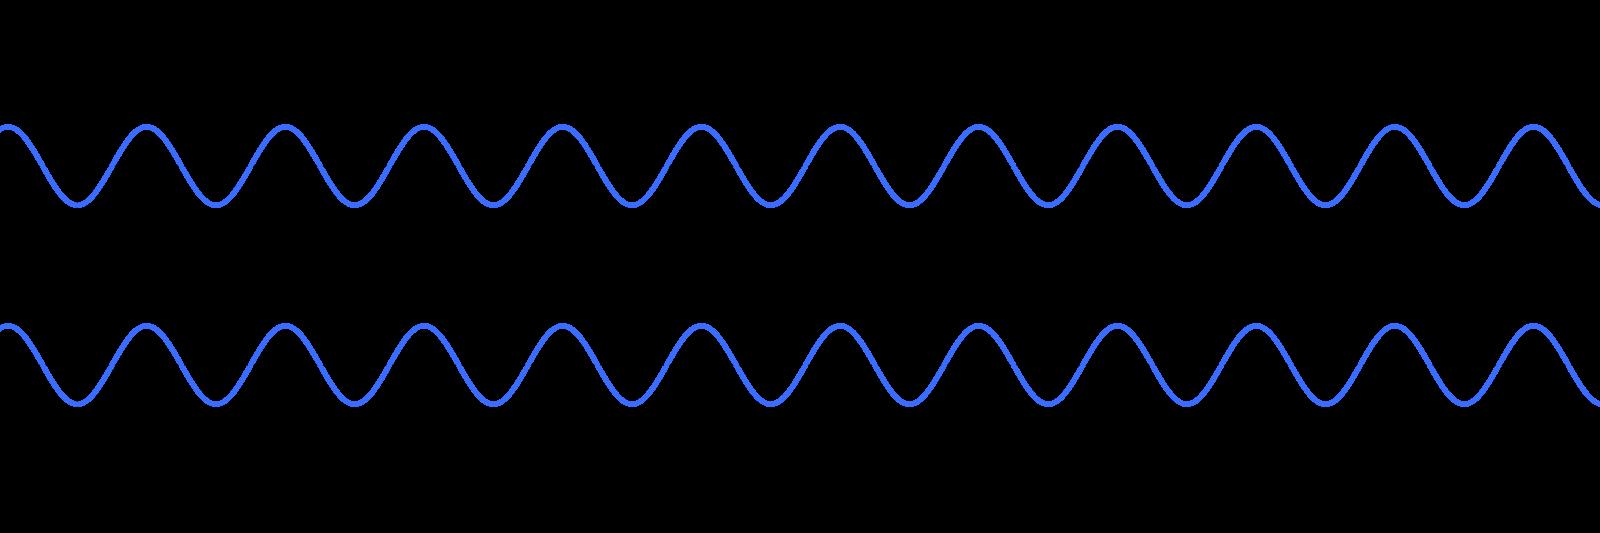 phase audio